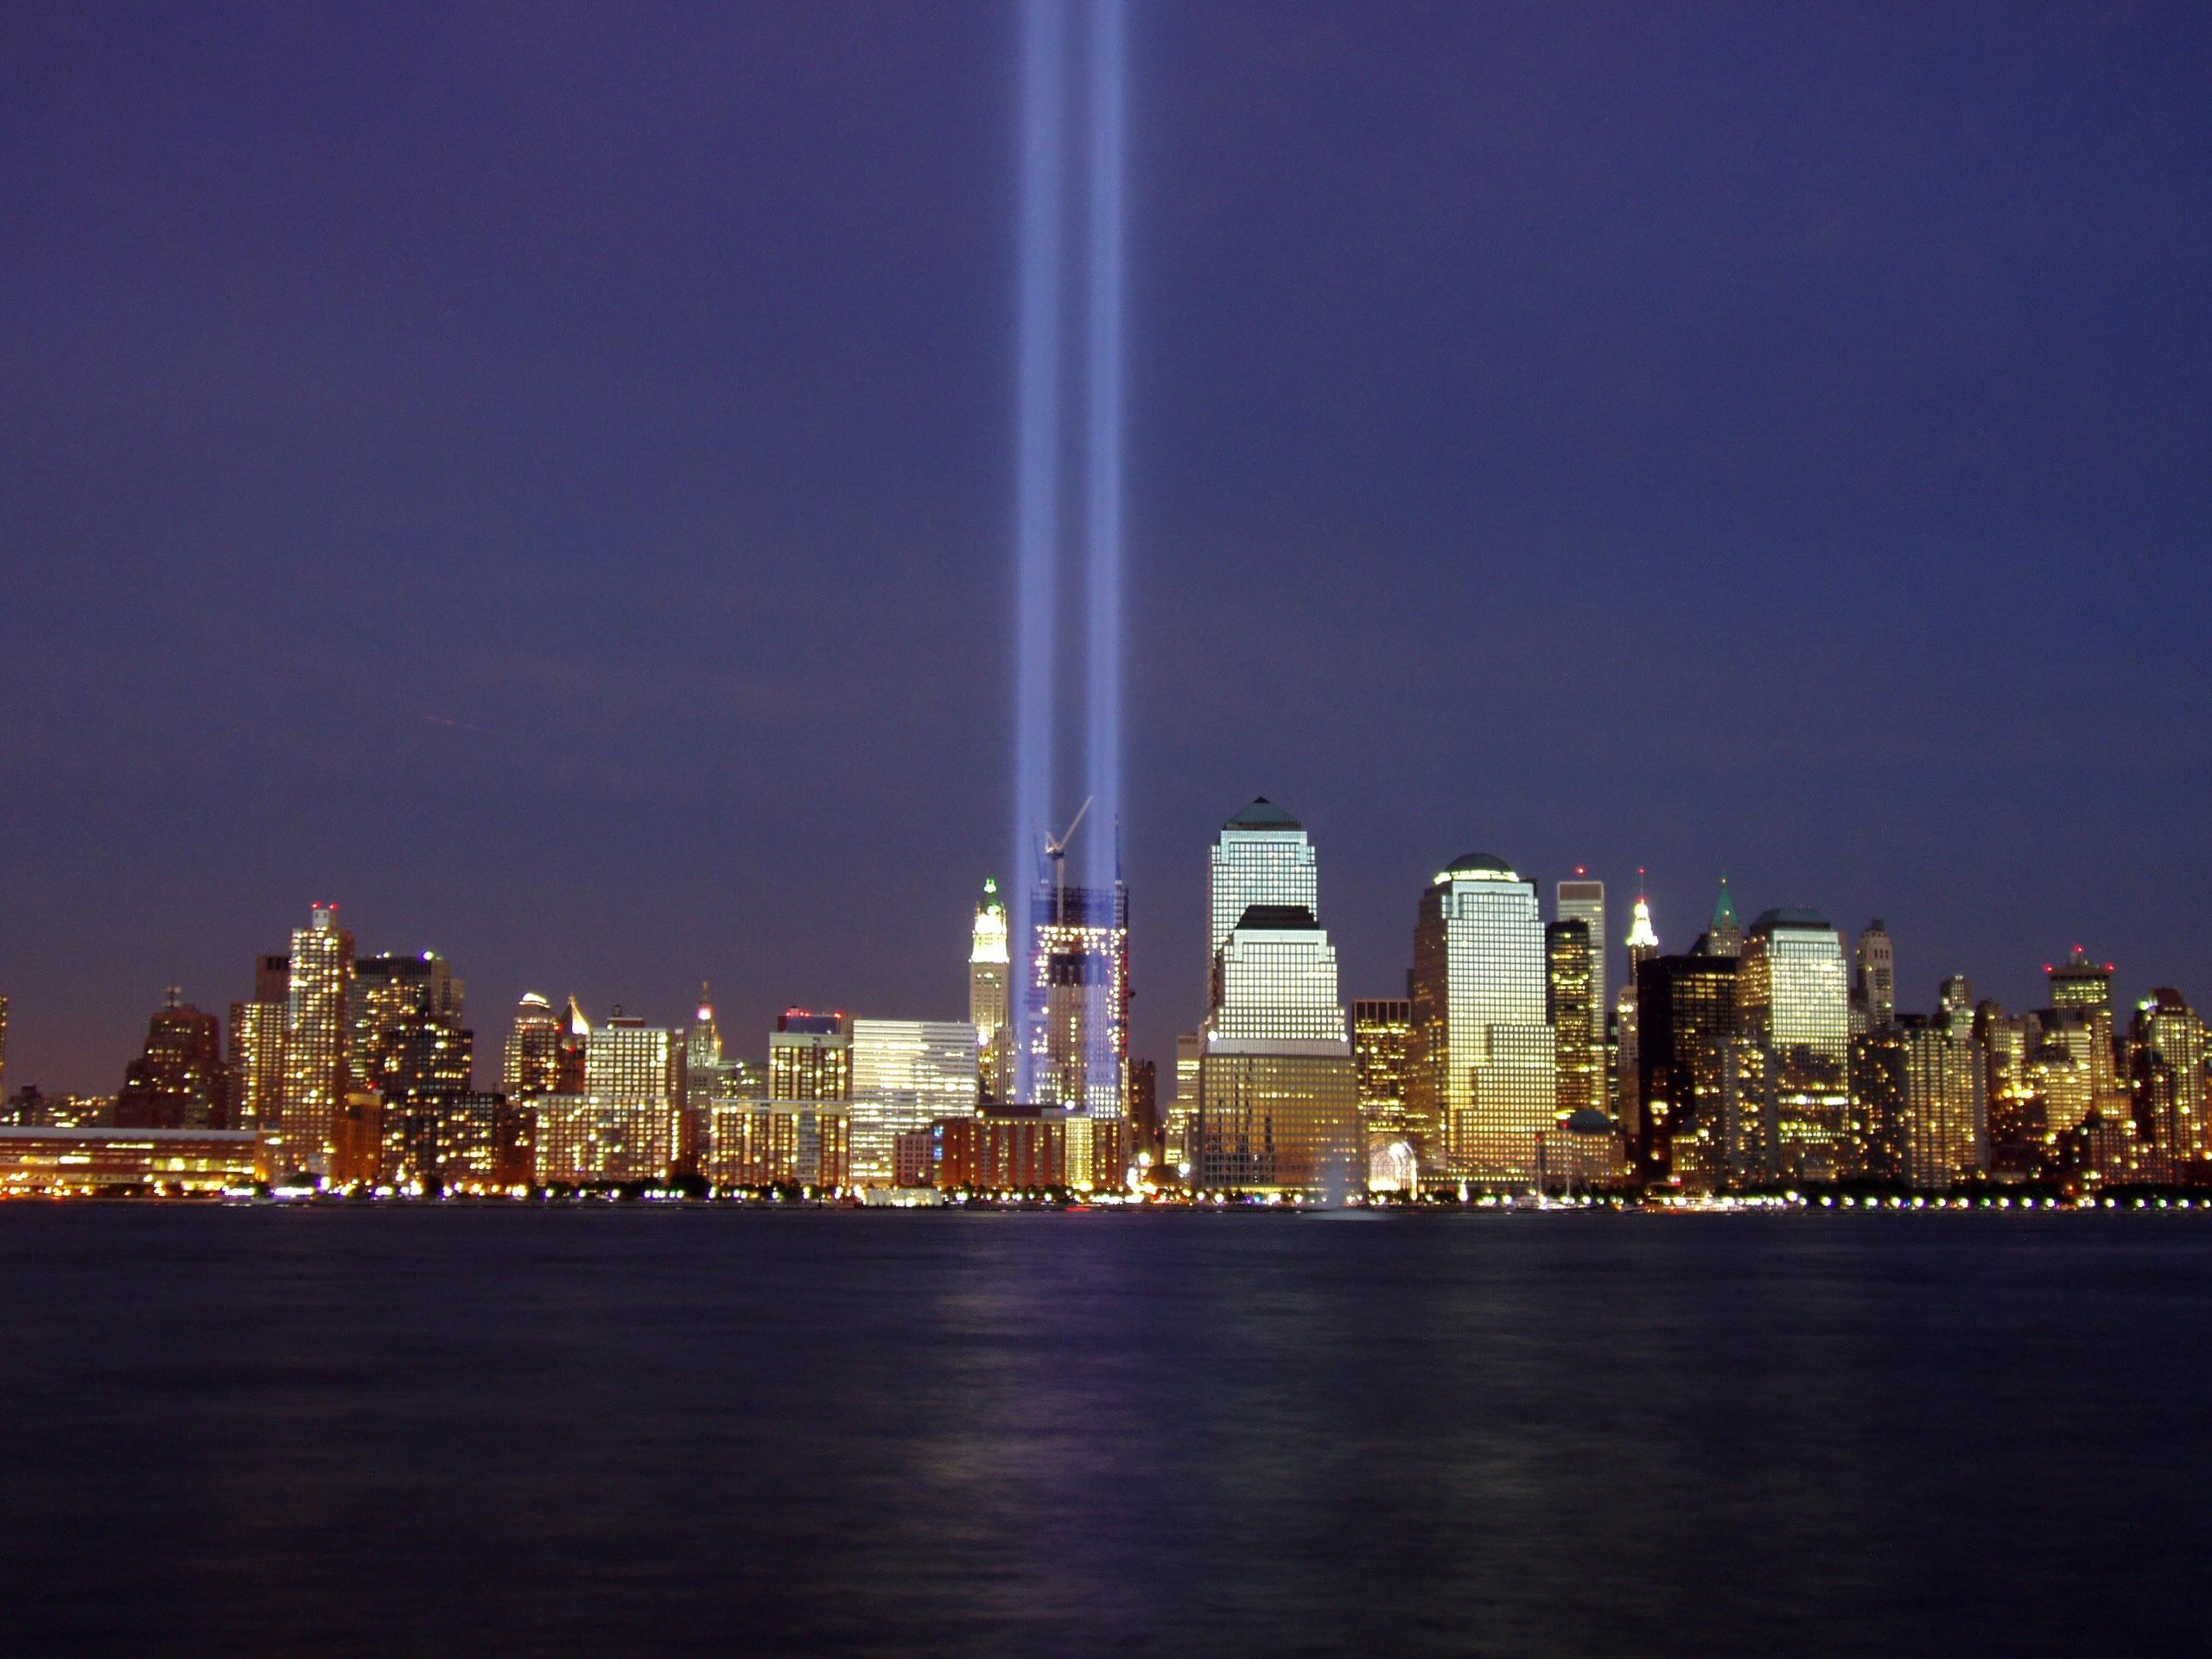 https://i2.wp.com/upload.wikimedia.org/wikipedia/commons/3/35/Wtc-2004-memorial.jpg